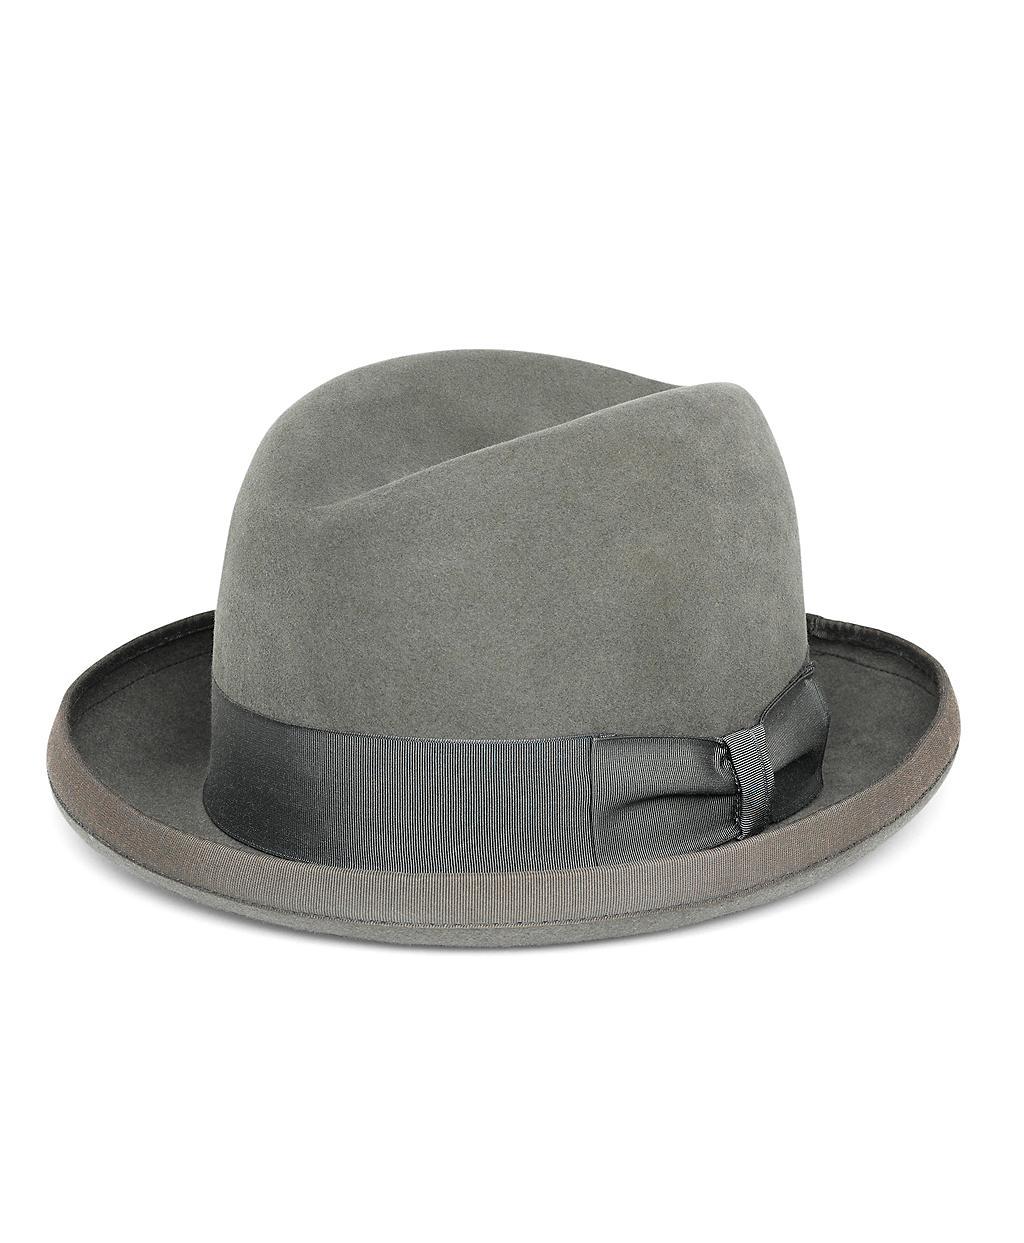 ACCESSORIES - Hats Brooks Brothers lbSdZiMCZk